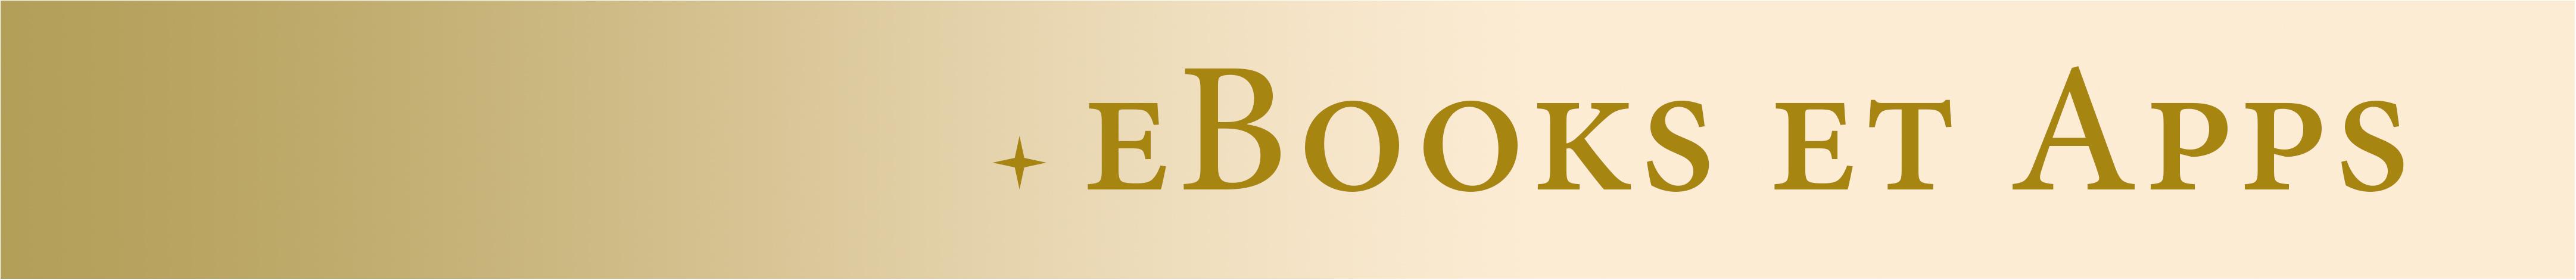 Ebooks et apps